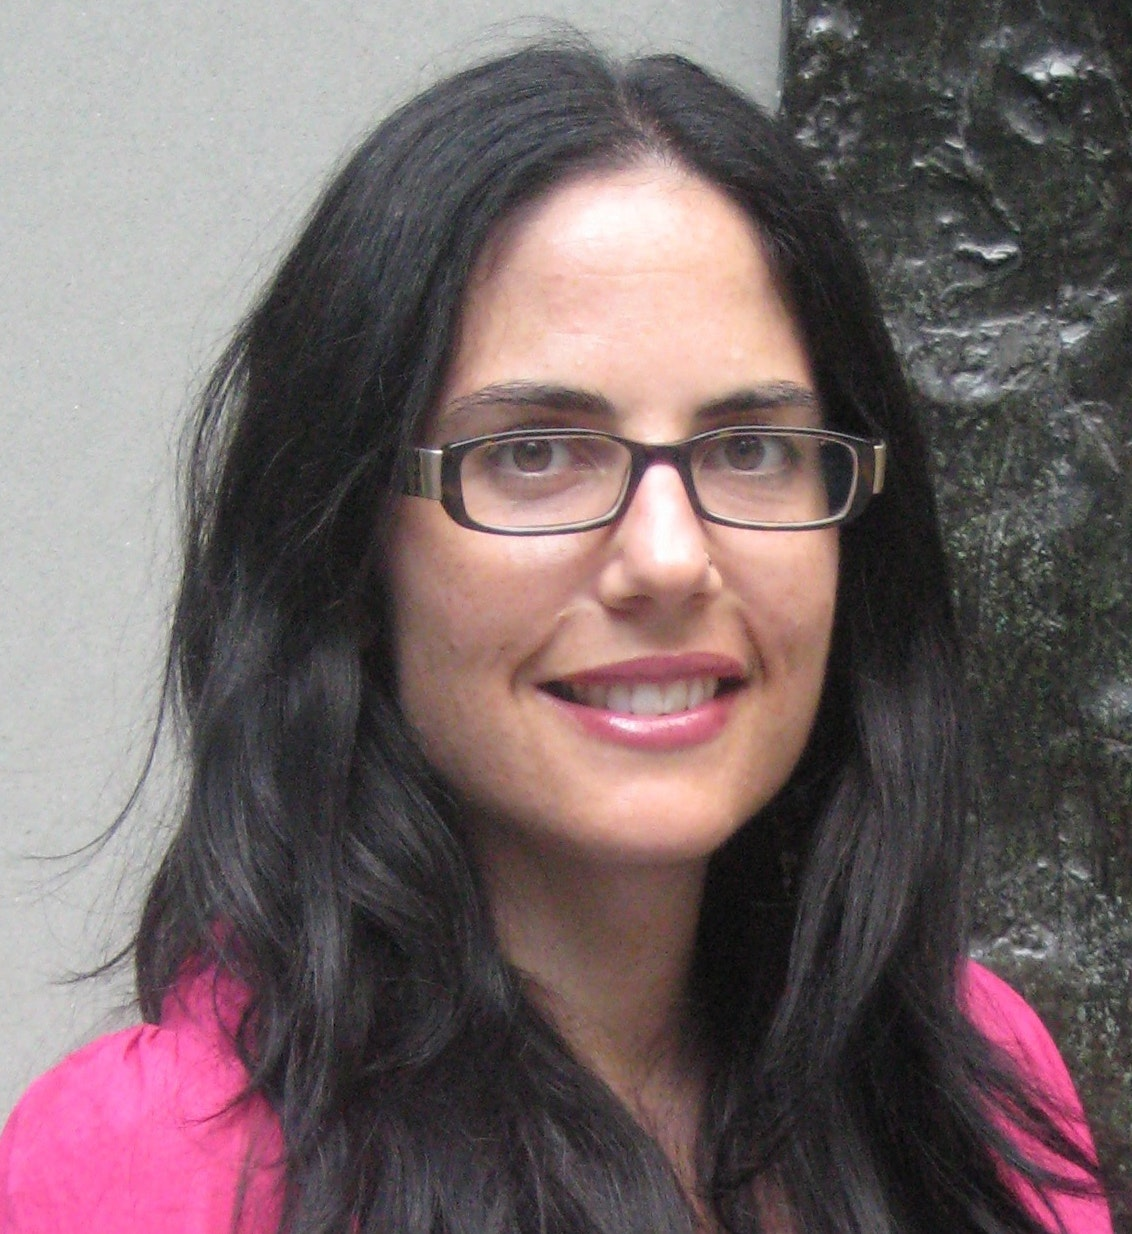 Lisa Mazzola